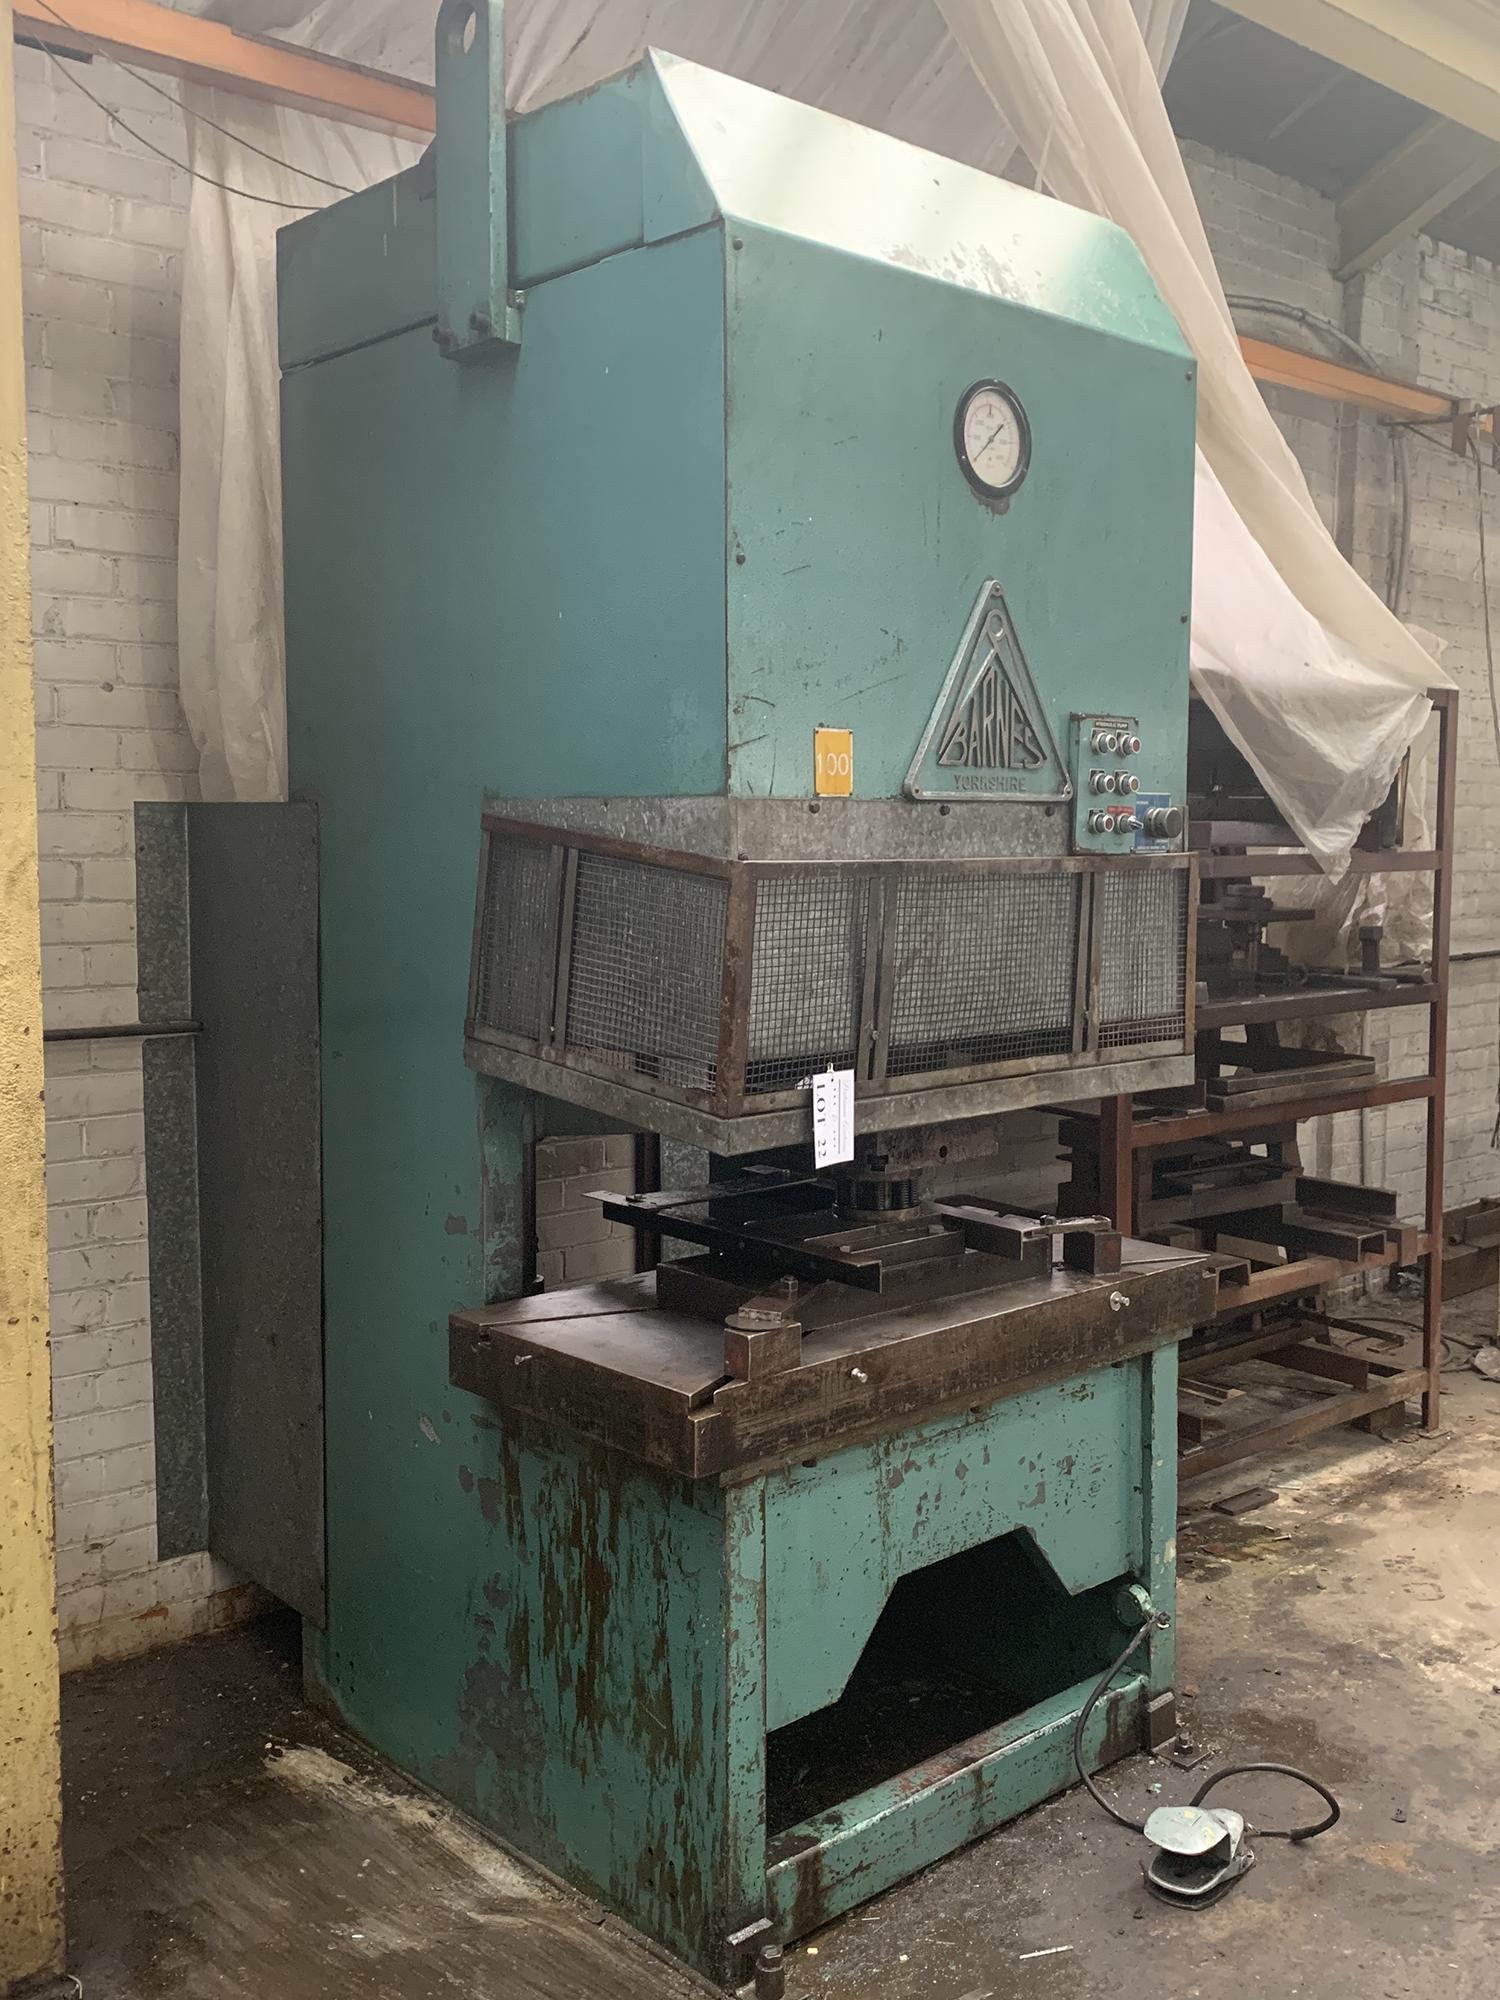 Barnes Hydraulic Press. 100 Ton Capacity. 24'' x 48'' Platen Size. - Image 2 of 5